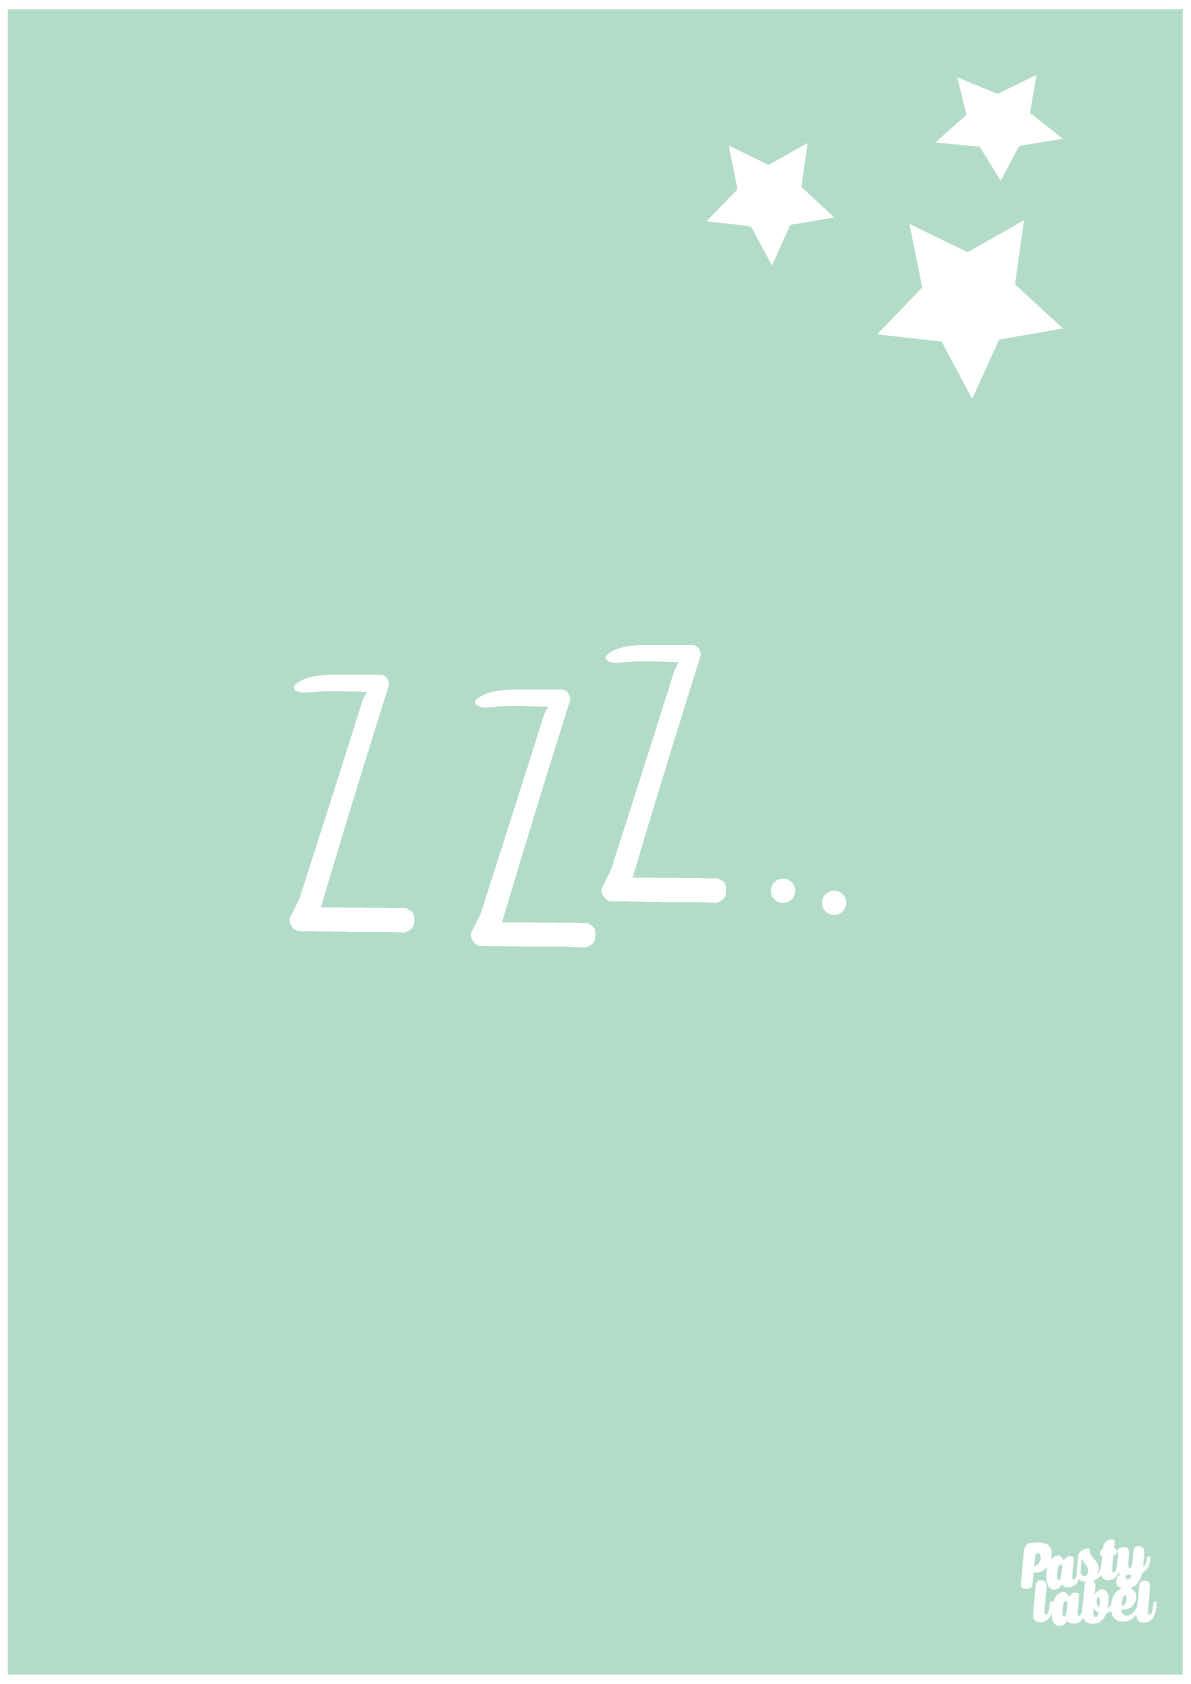 Product Poster Babykamer Slaapzacht Mint